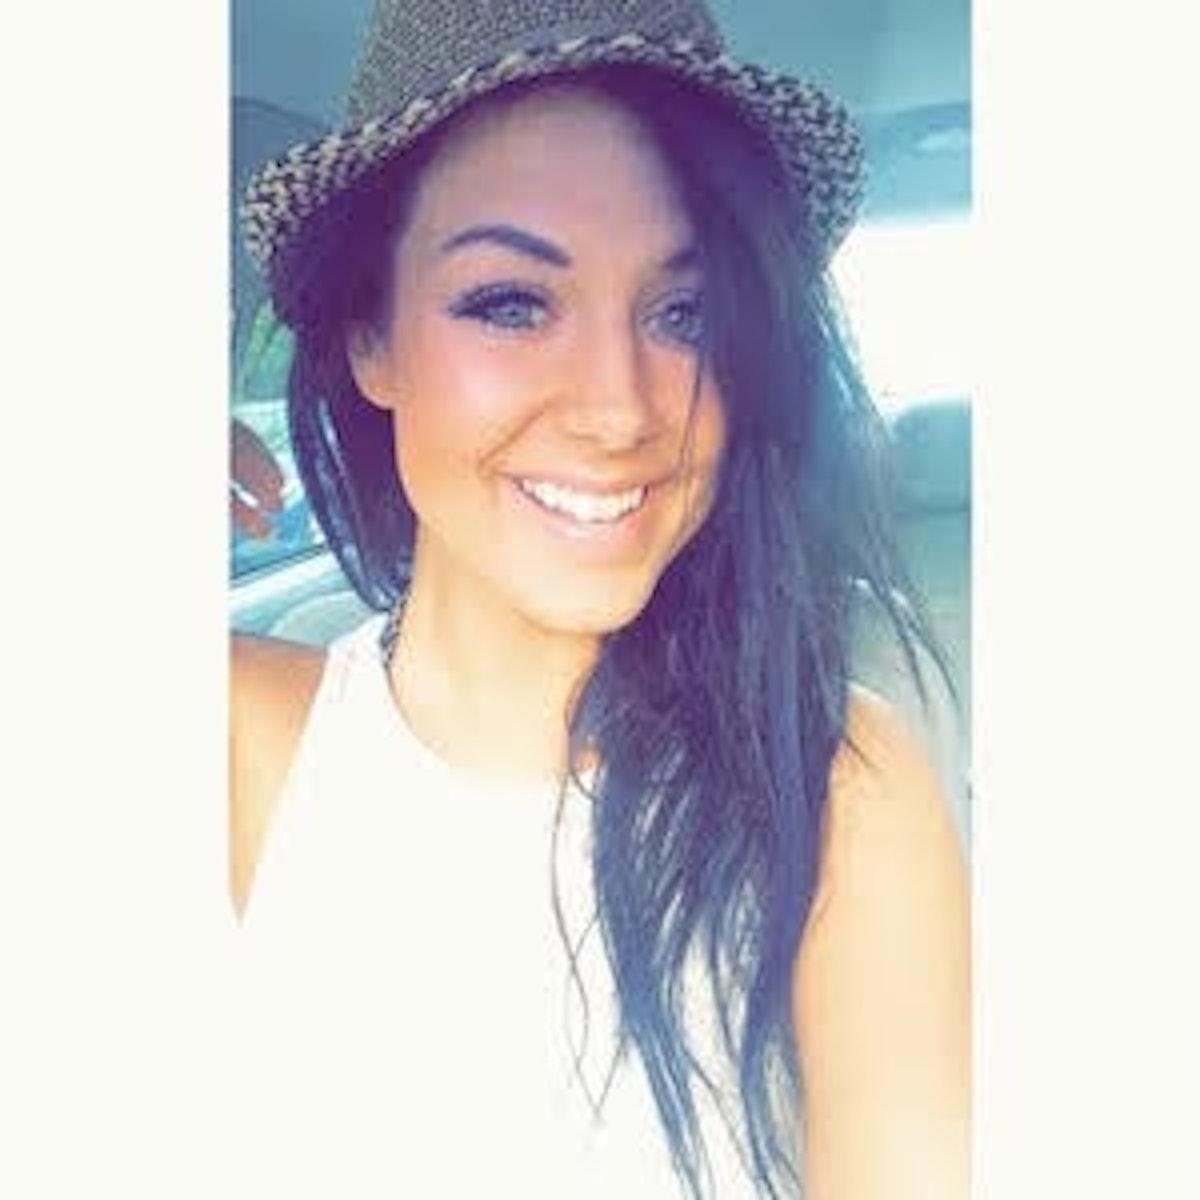 Amanda Ash